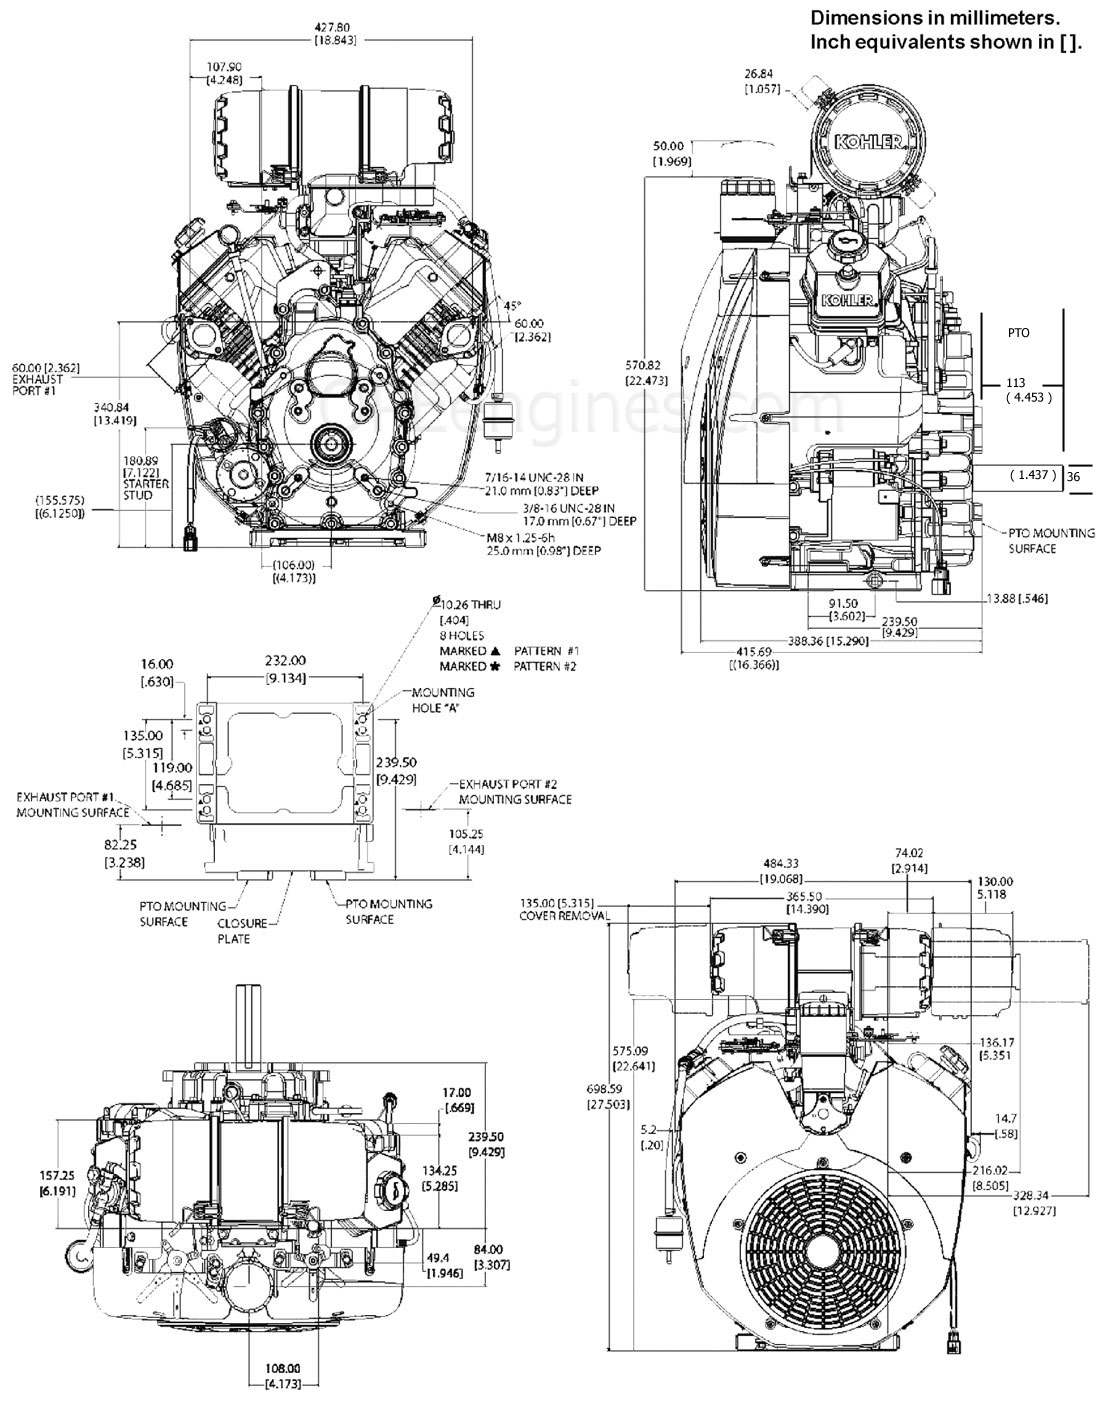 CH980_drawings?resize=680%2C878&ssl=1 25 hp kohler wiring diagram kohler command 25 hp diagram, kohler kohler motor wiring diagram at beritabola.co